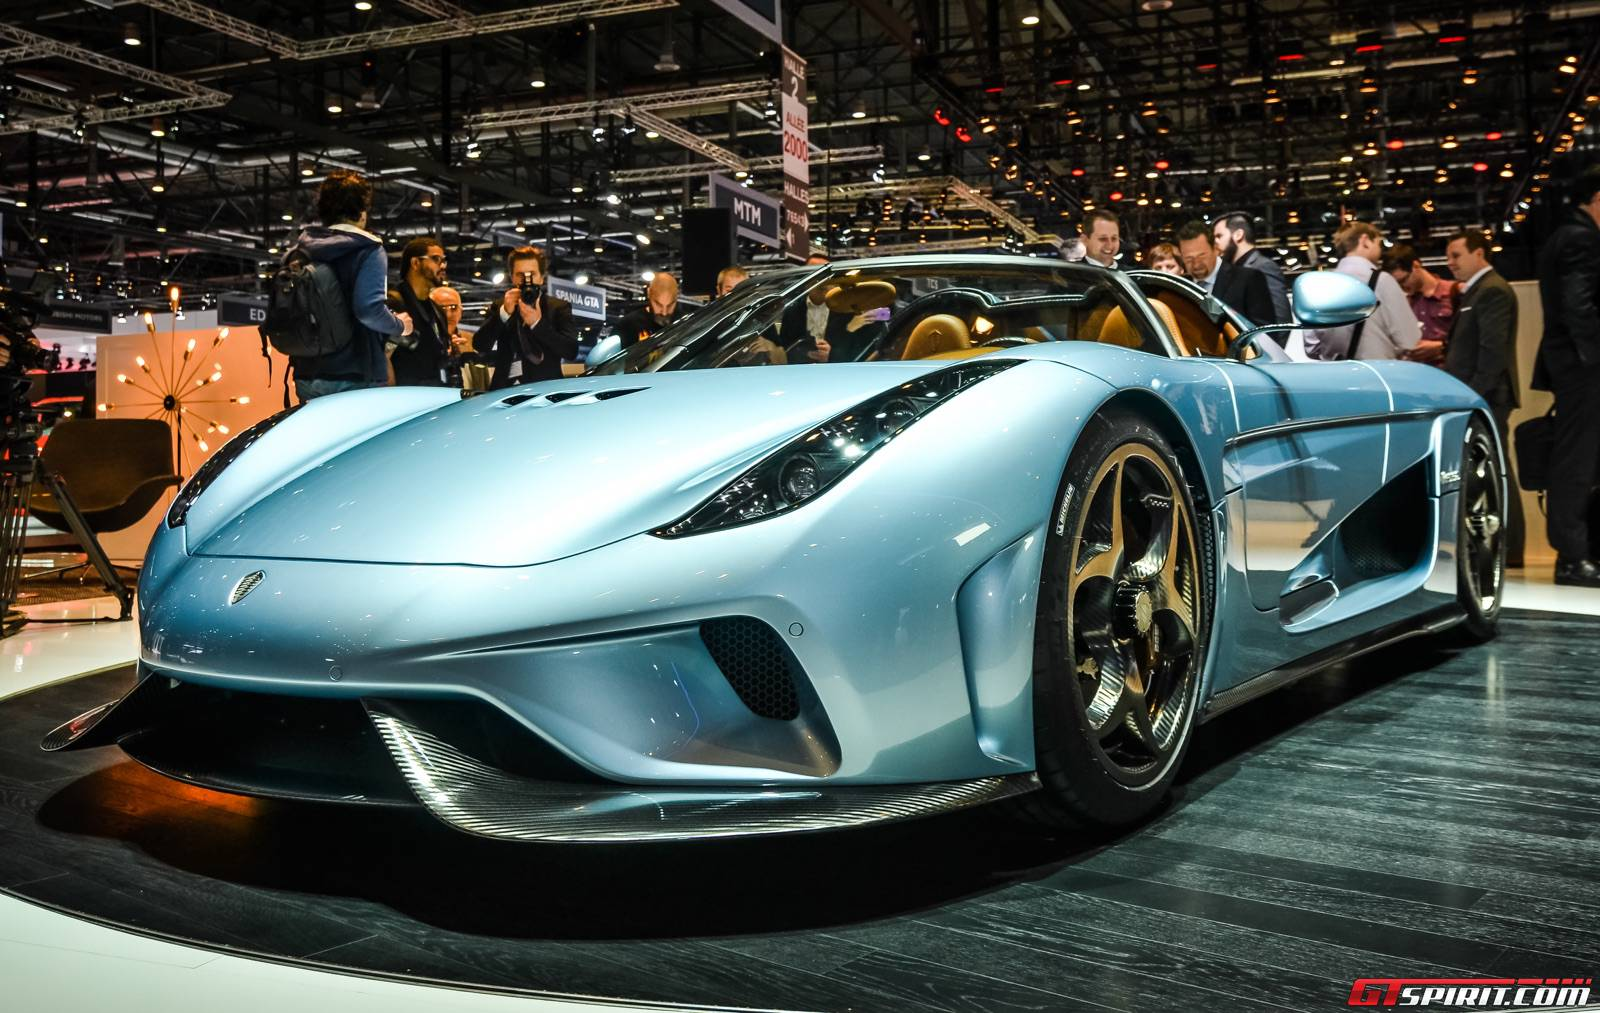 Video: Koenigsegg's Geneva Motor Show 2015 Reveal